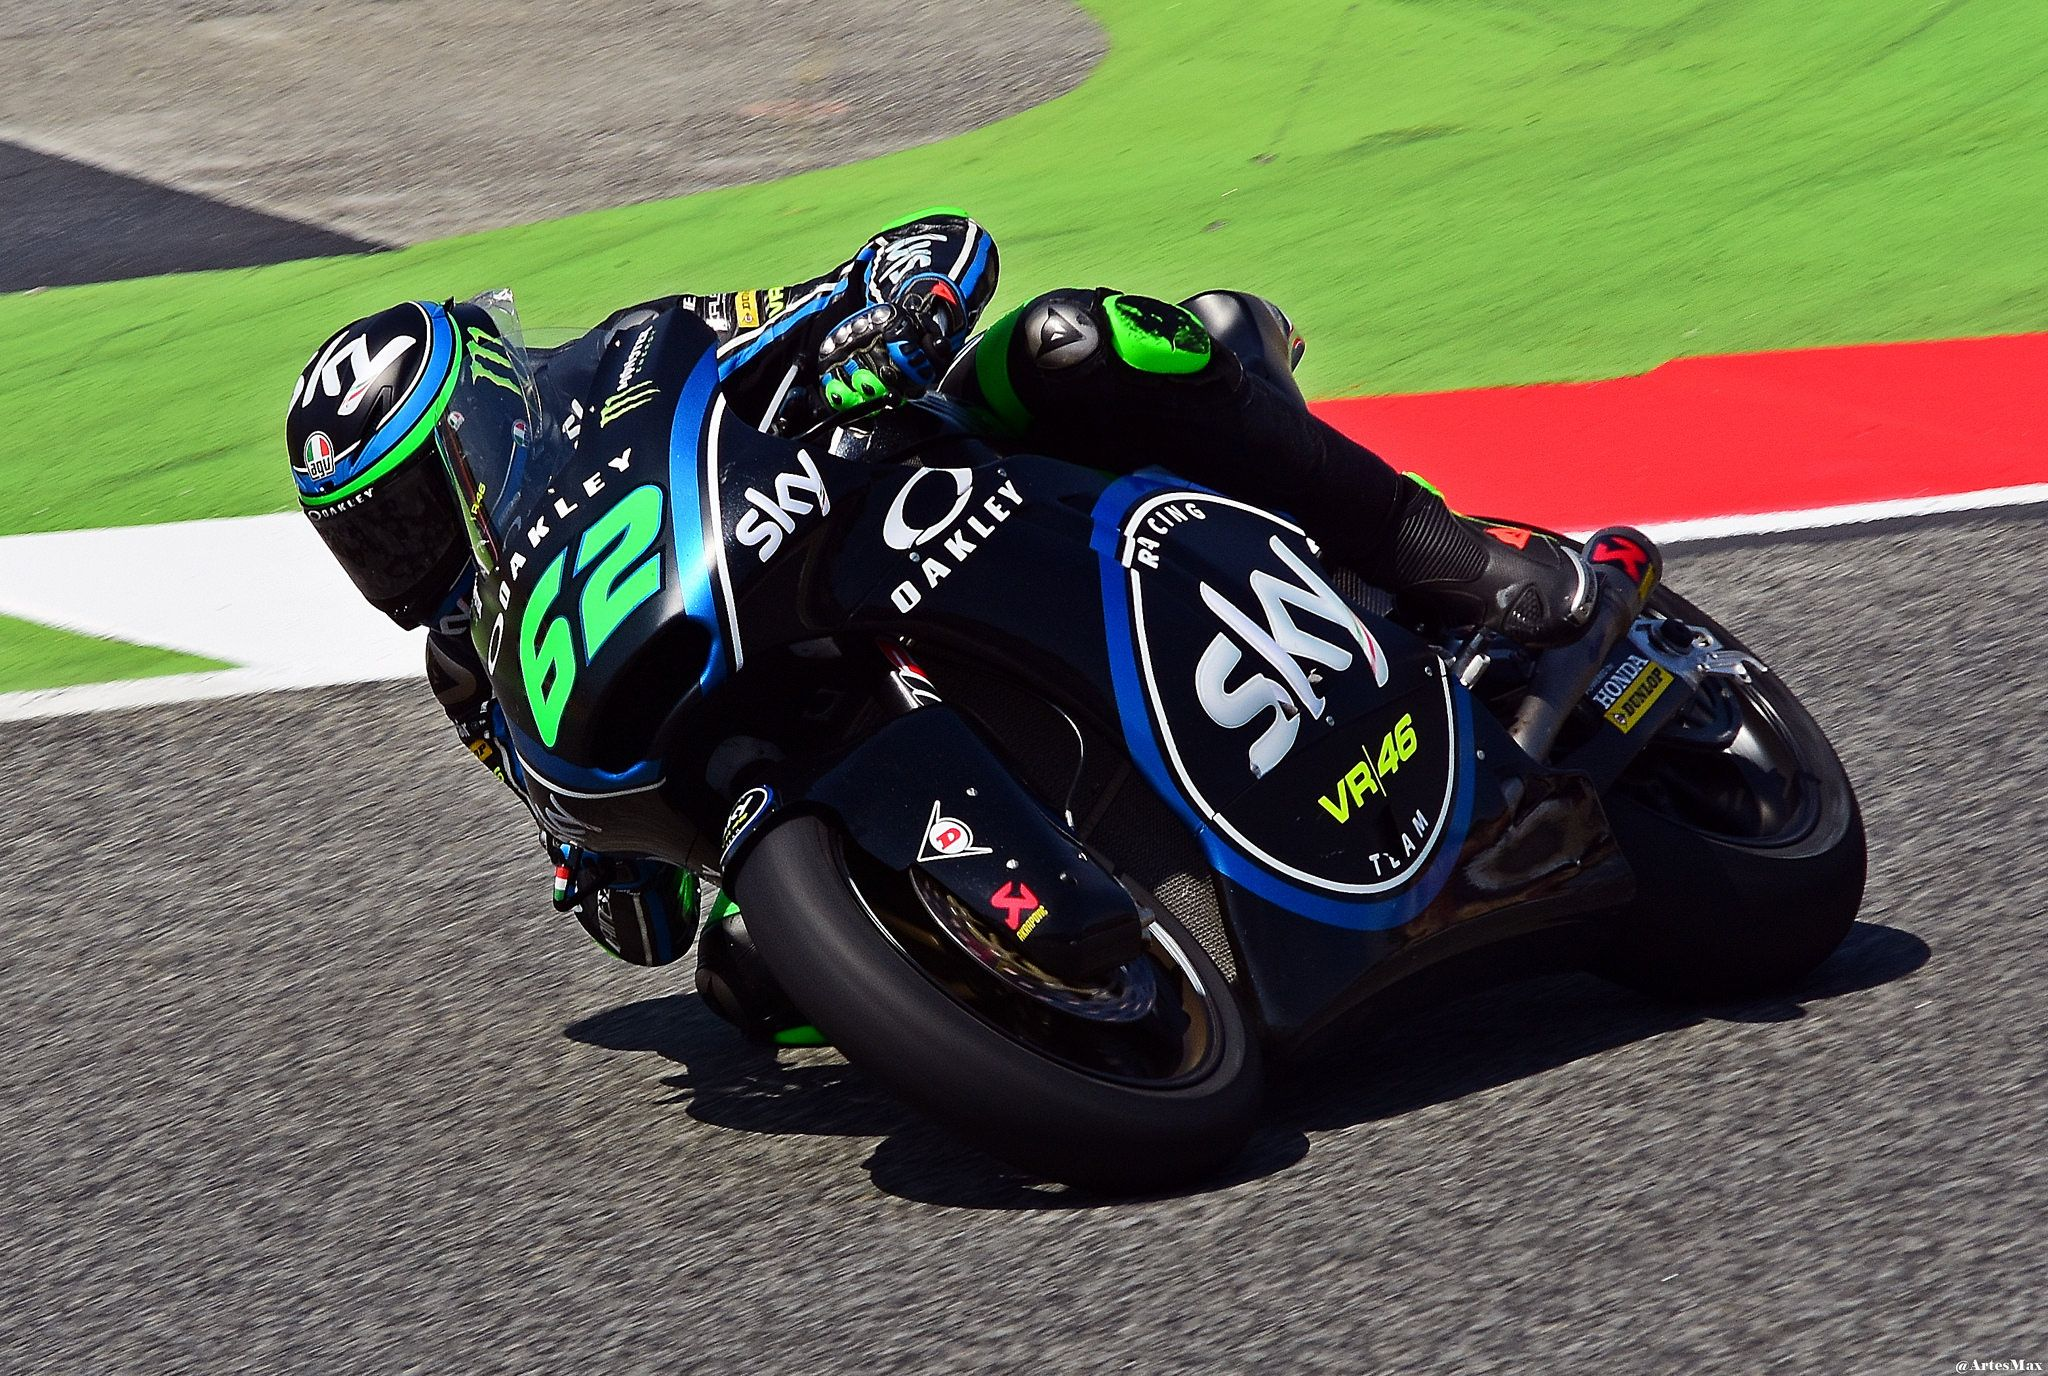 Kalex Stefano Manzi Ita Sky Racing Team Vr46 Racing Team Racing Motogp